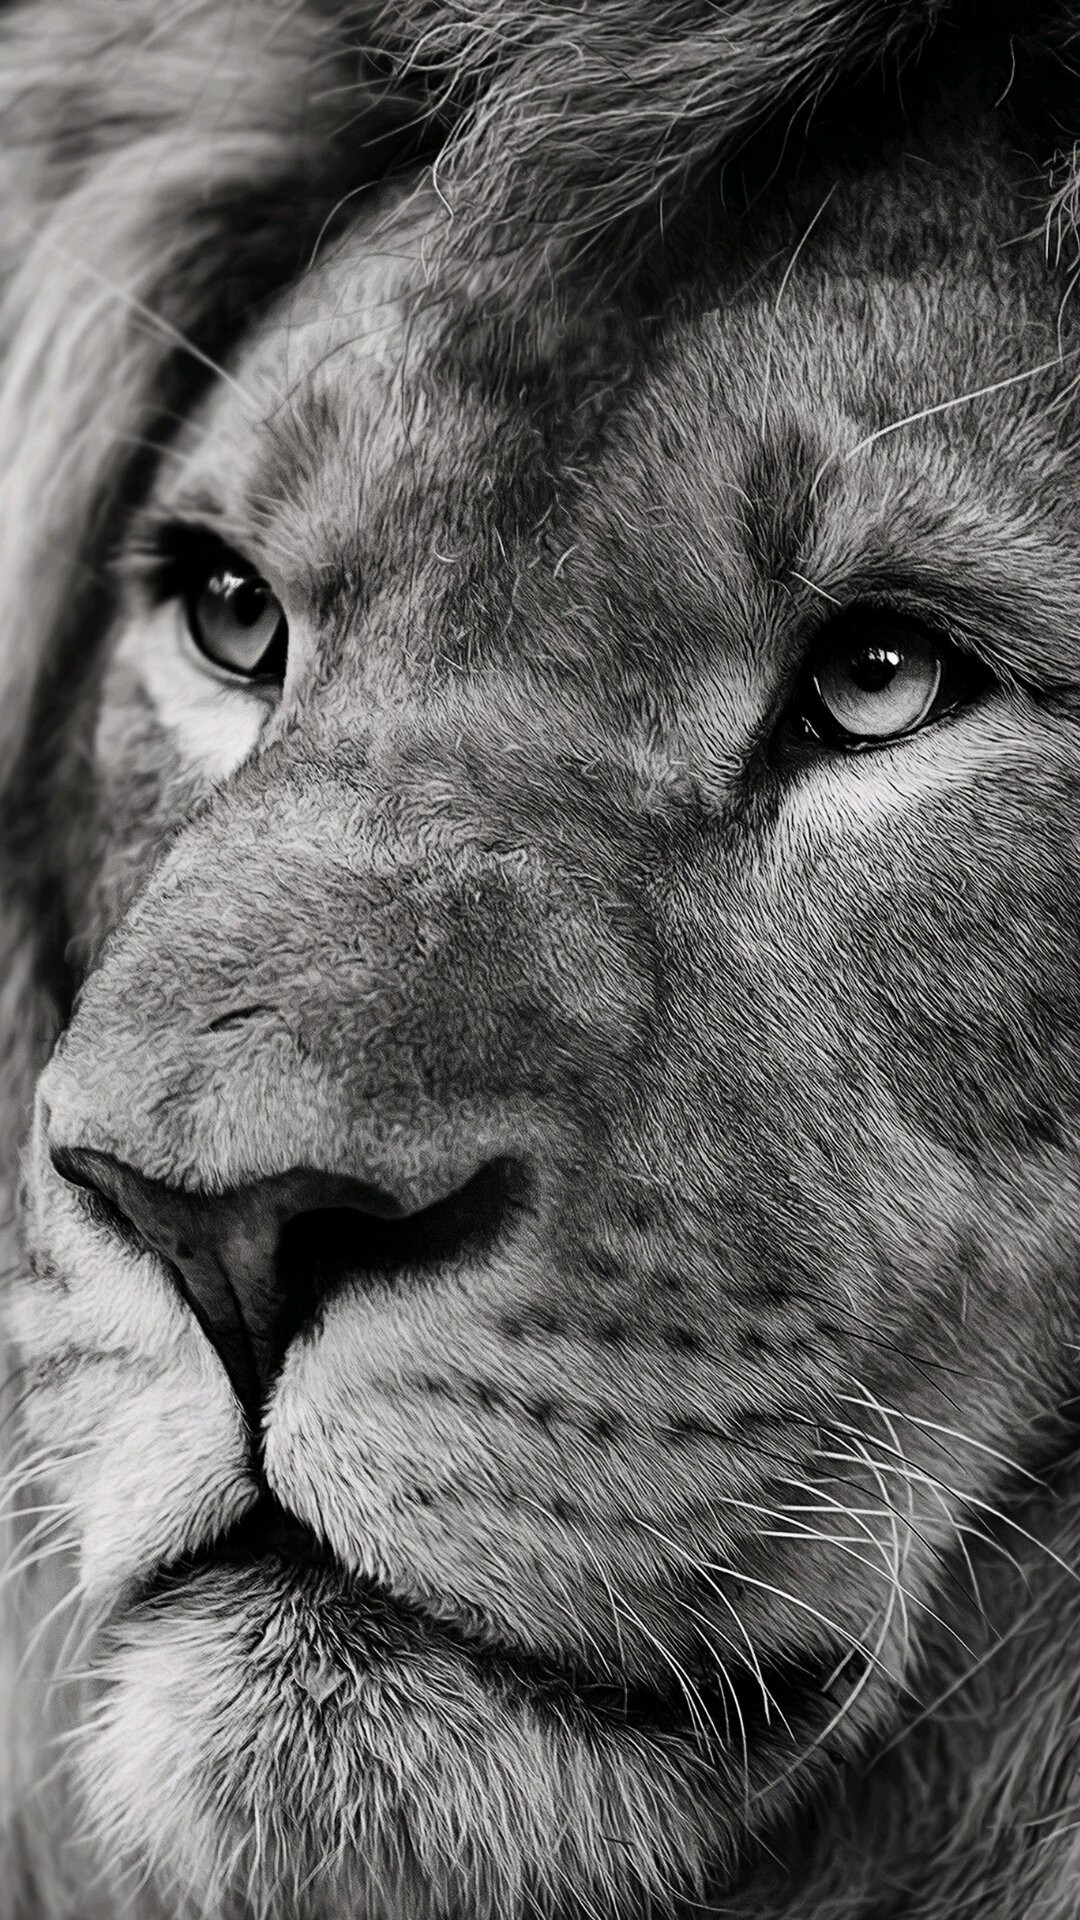 Lion iPhone 7 wallpaper